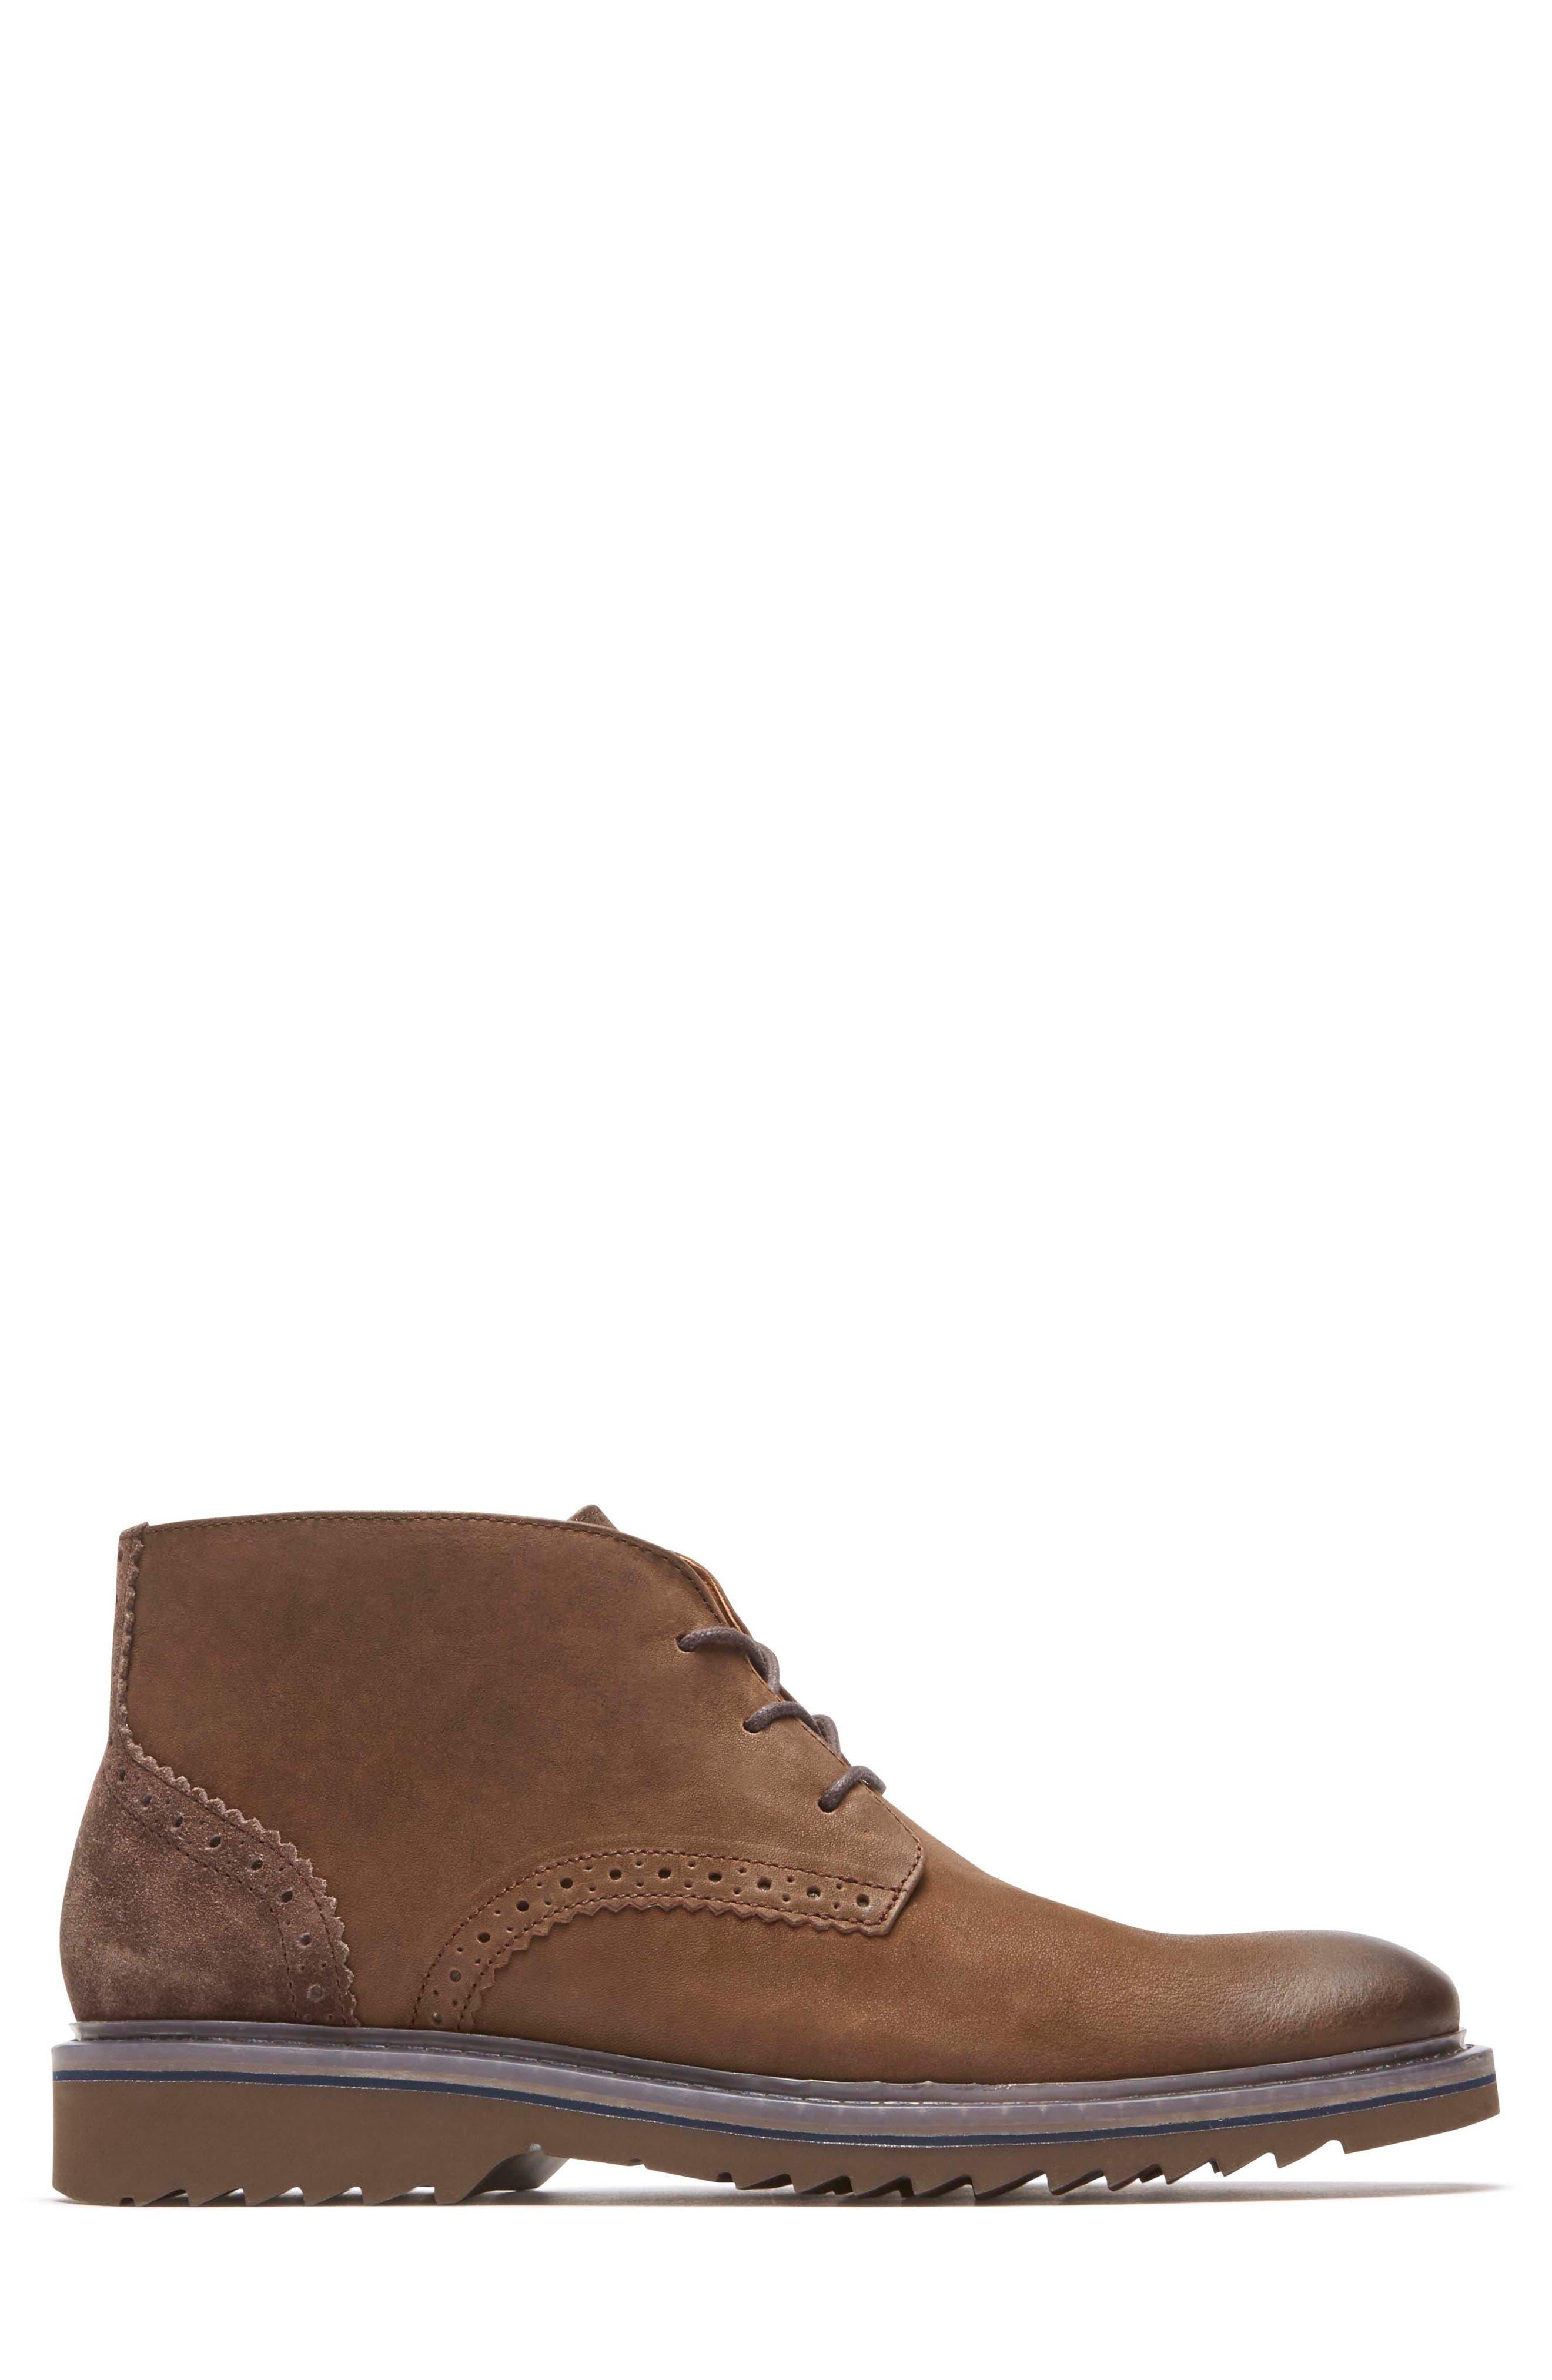 Jaxson Chukka Boot,                             Alternate thumbnail 3, color,                             Brown/ Brown Leather